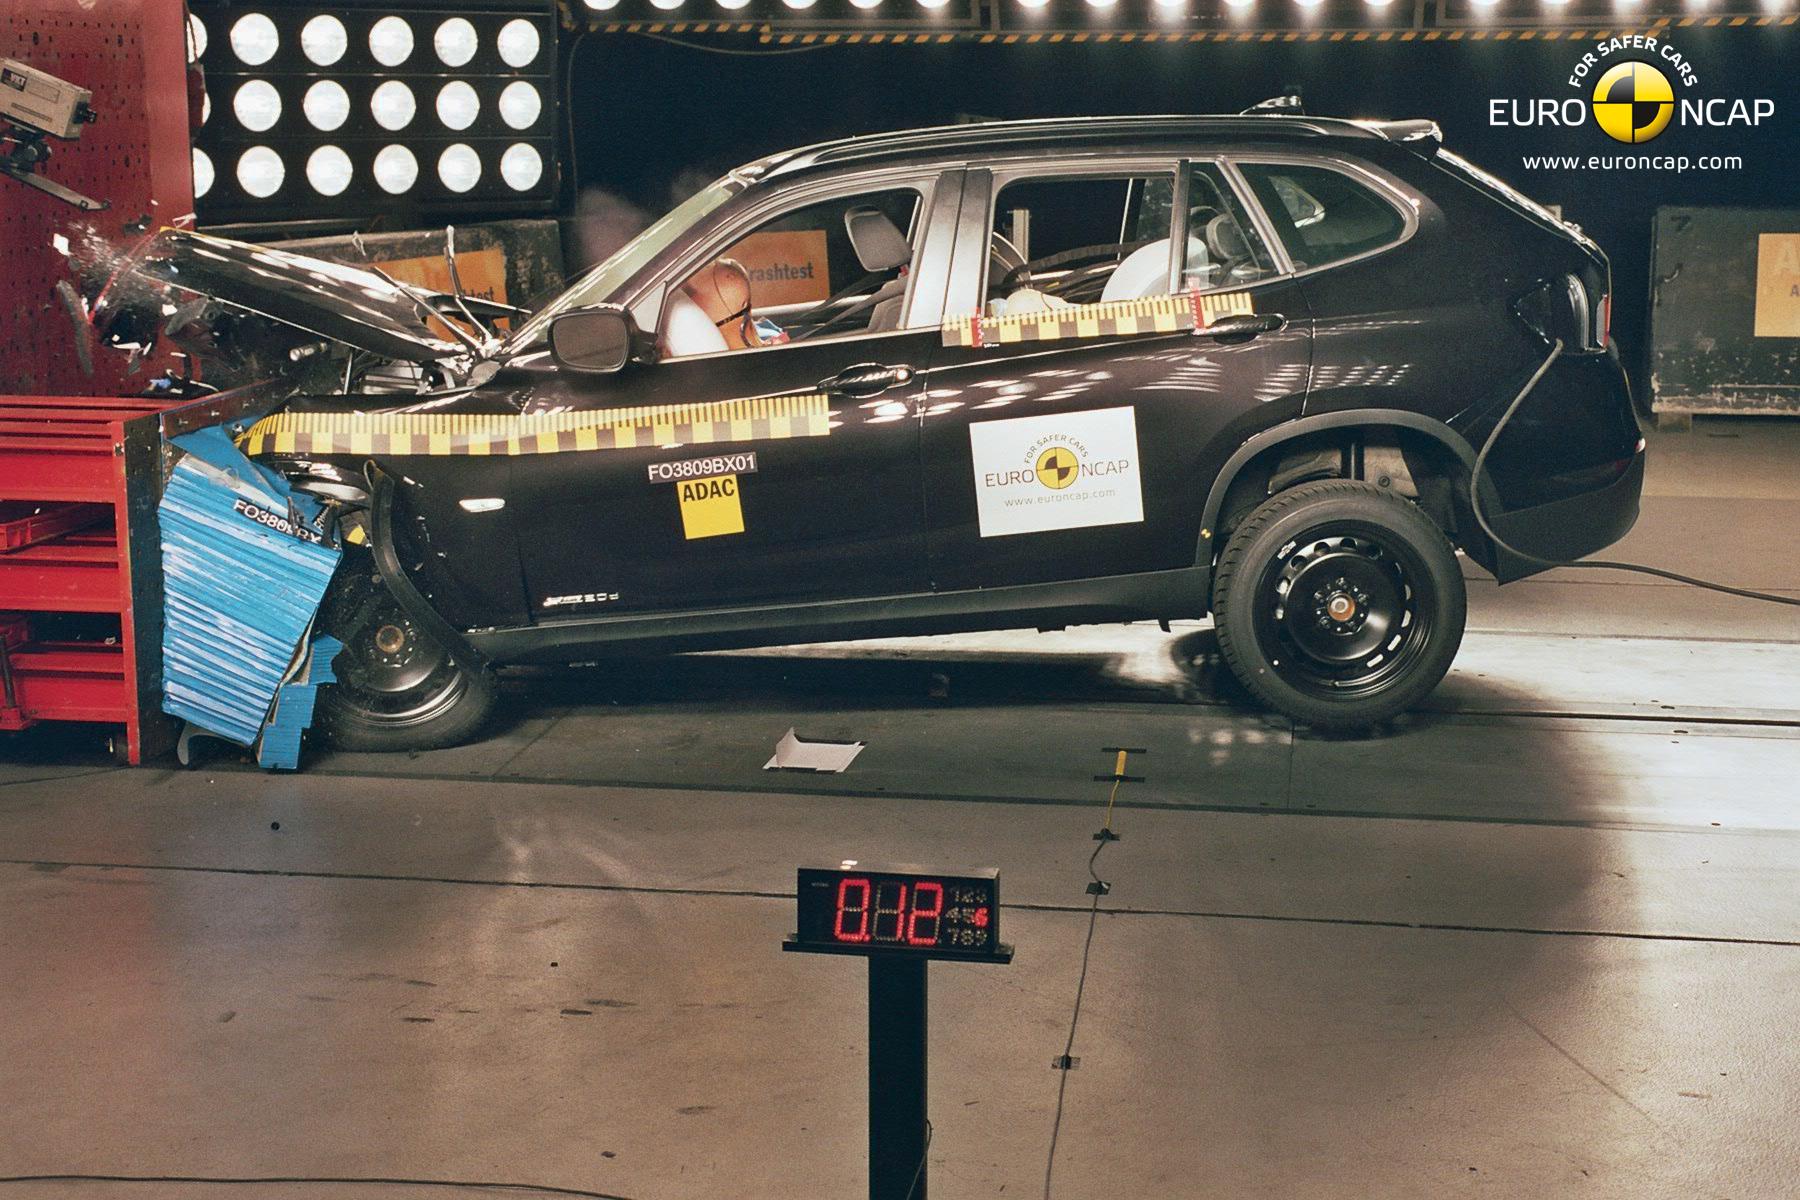 2011 BMW X1 Euro NCAP test